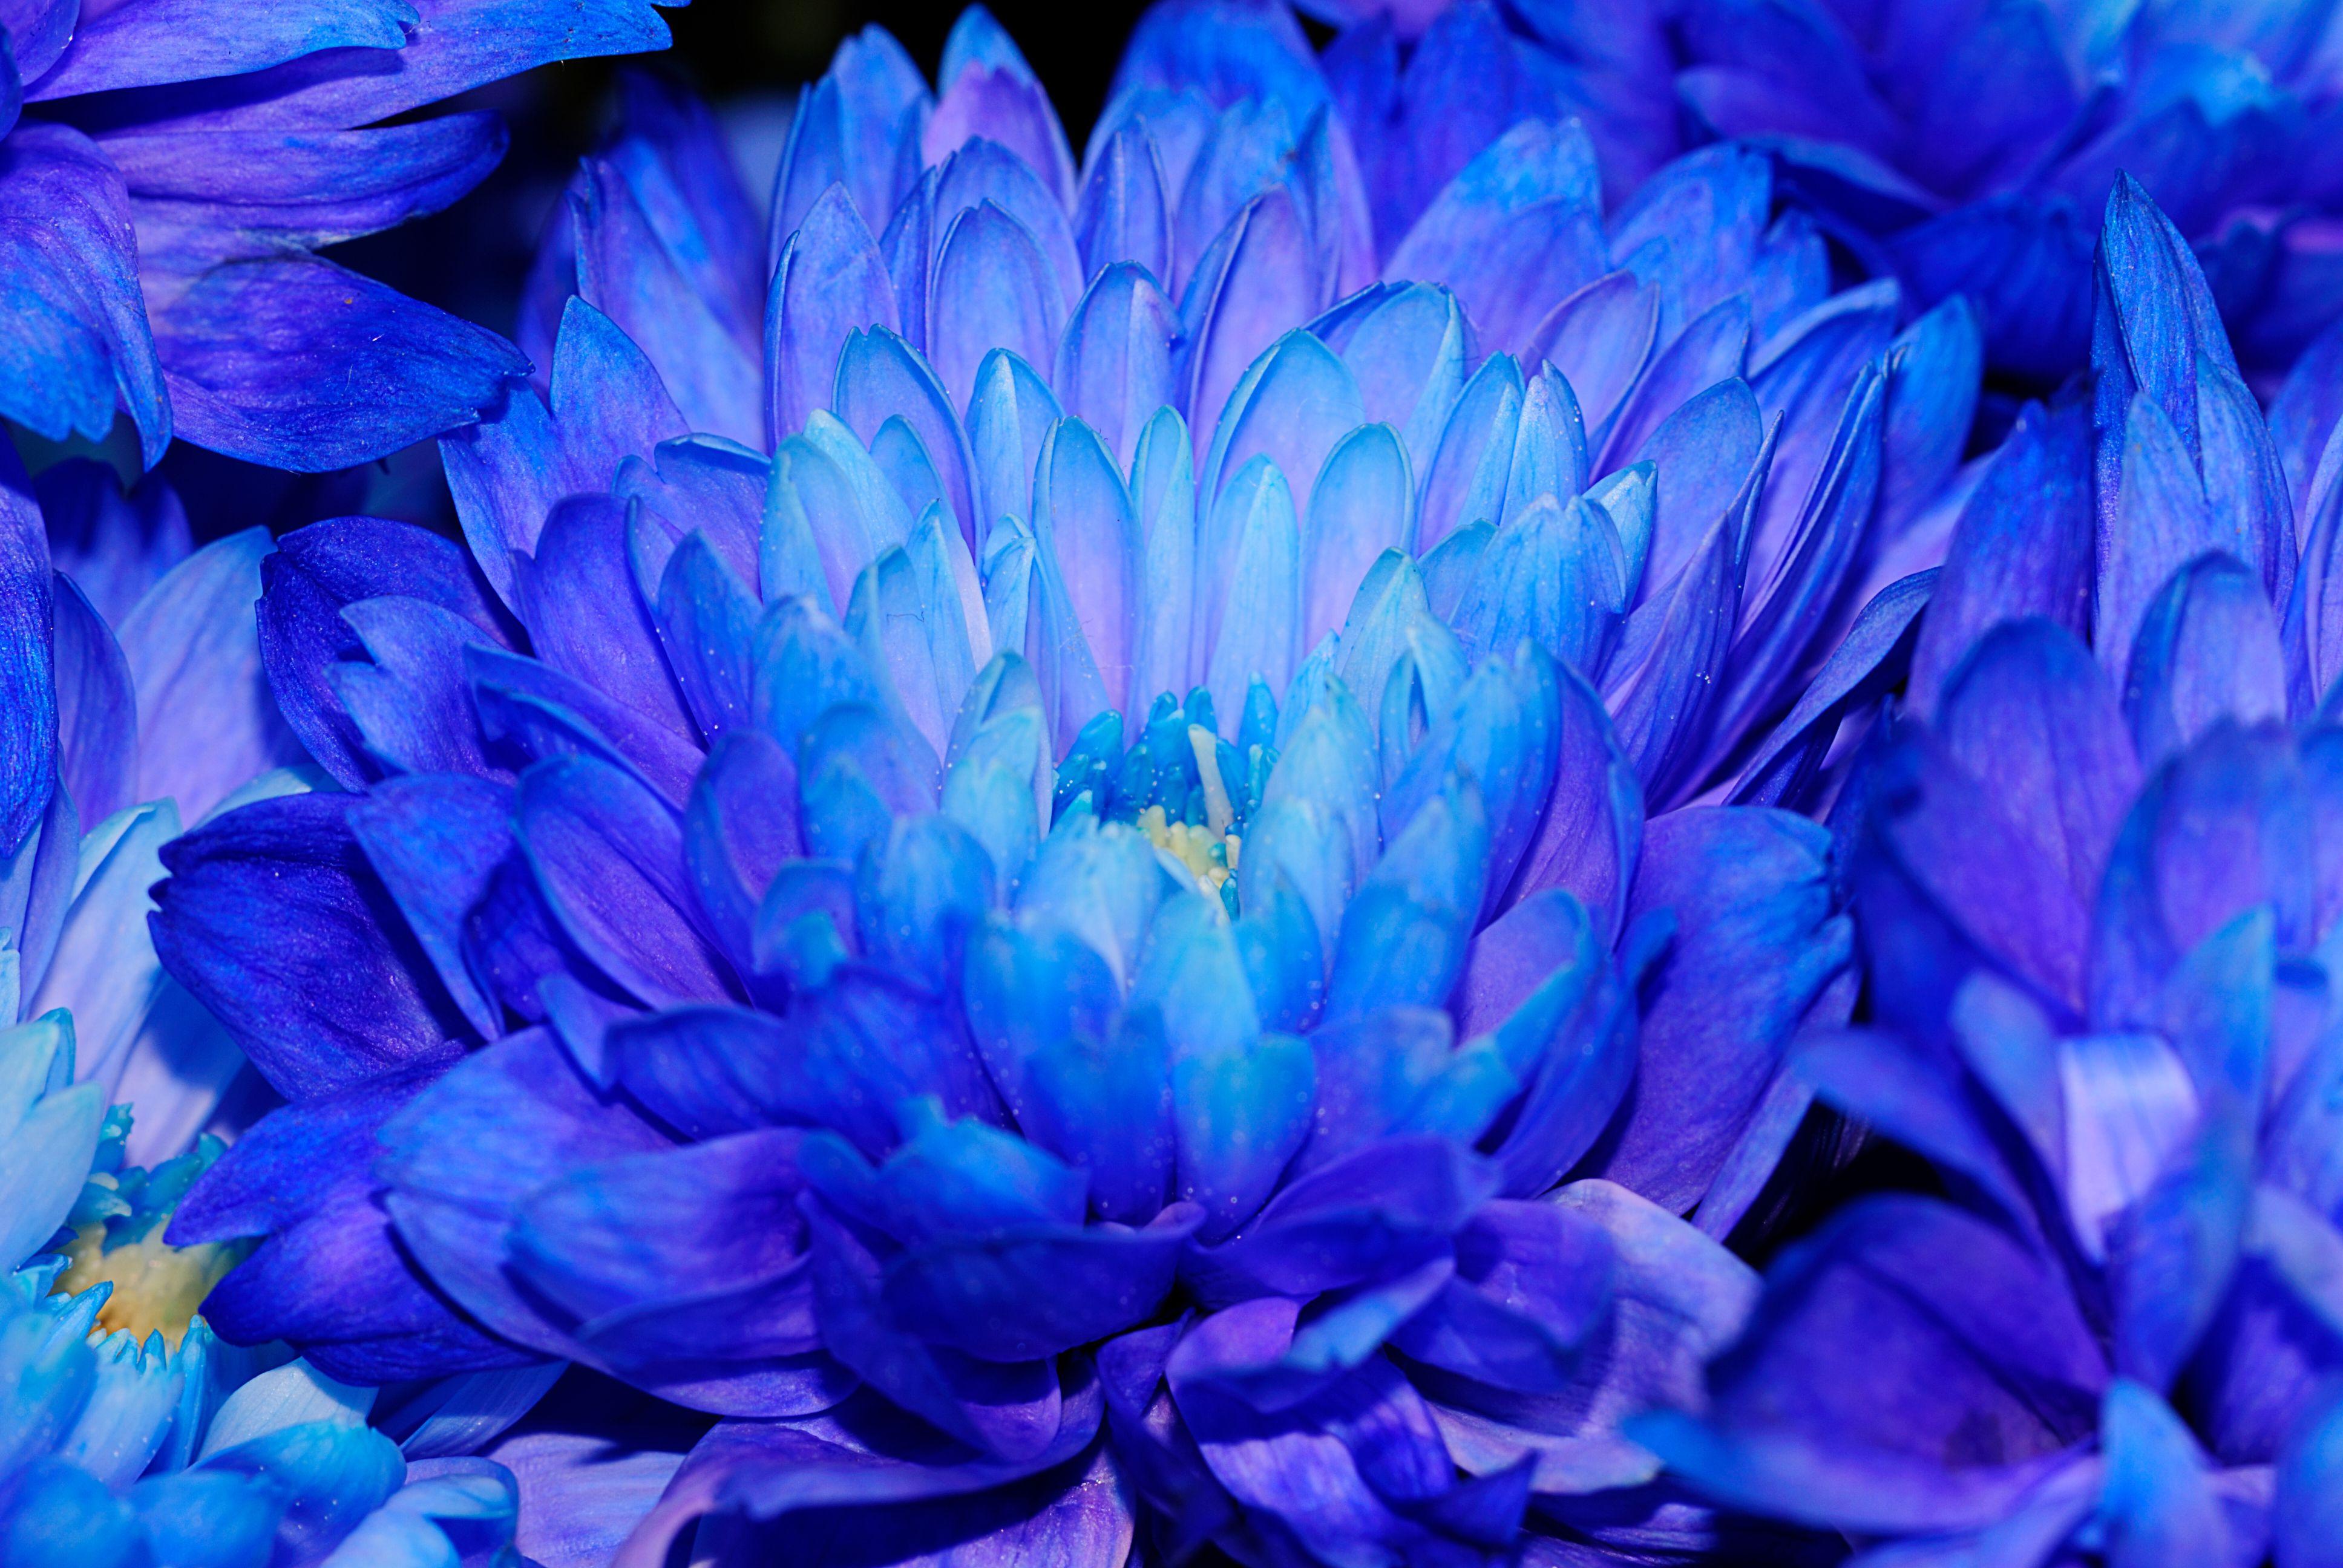 картинки ярко-синего цвета бокалы